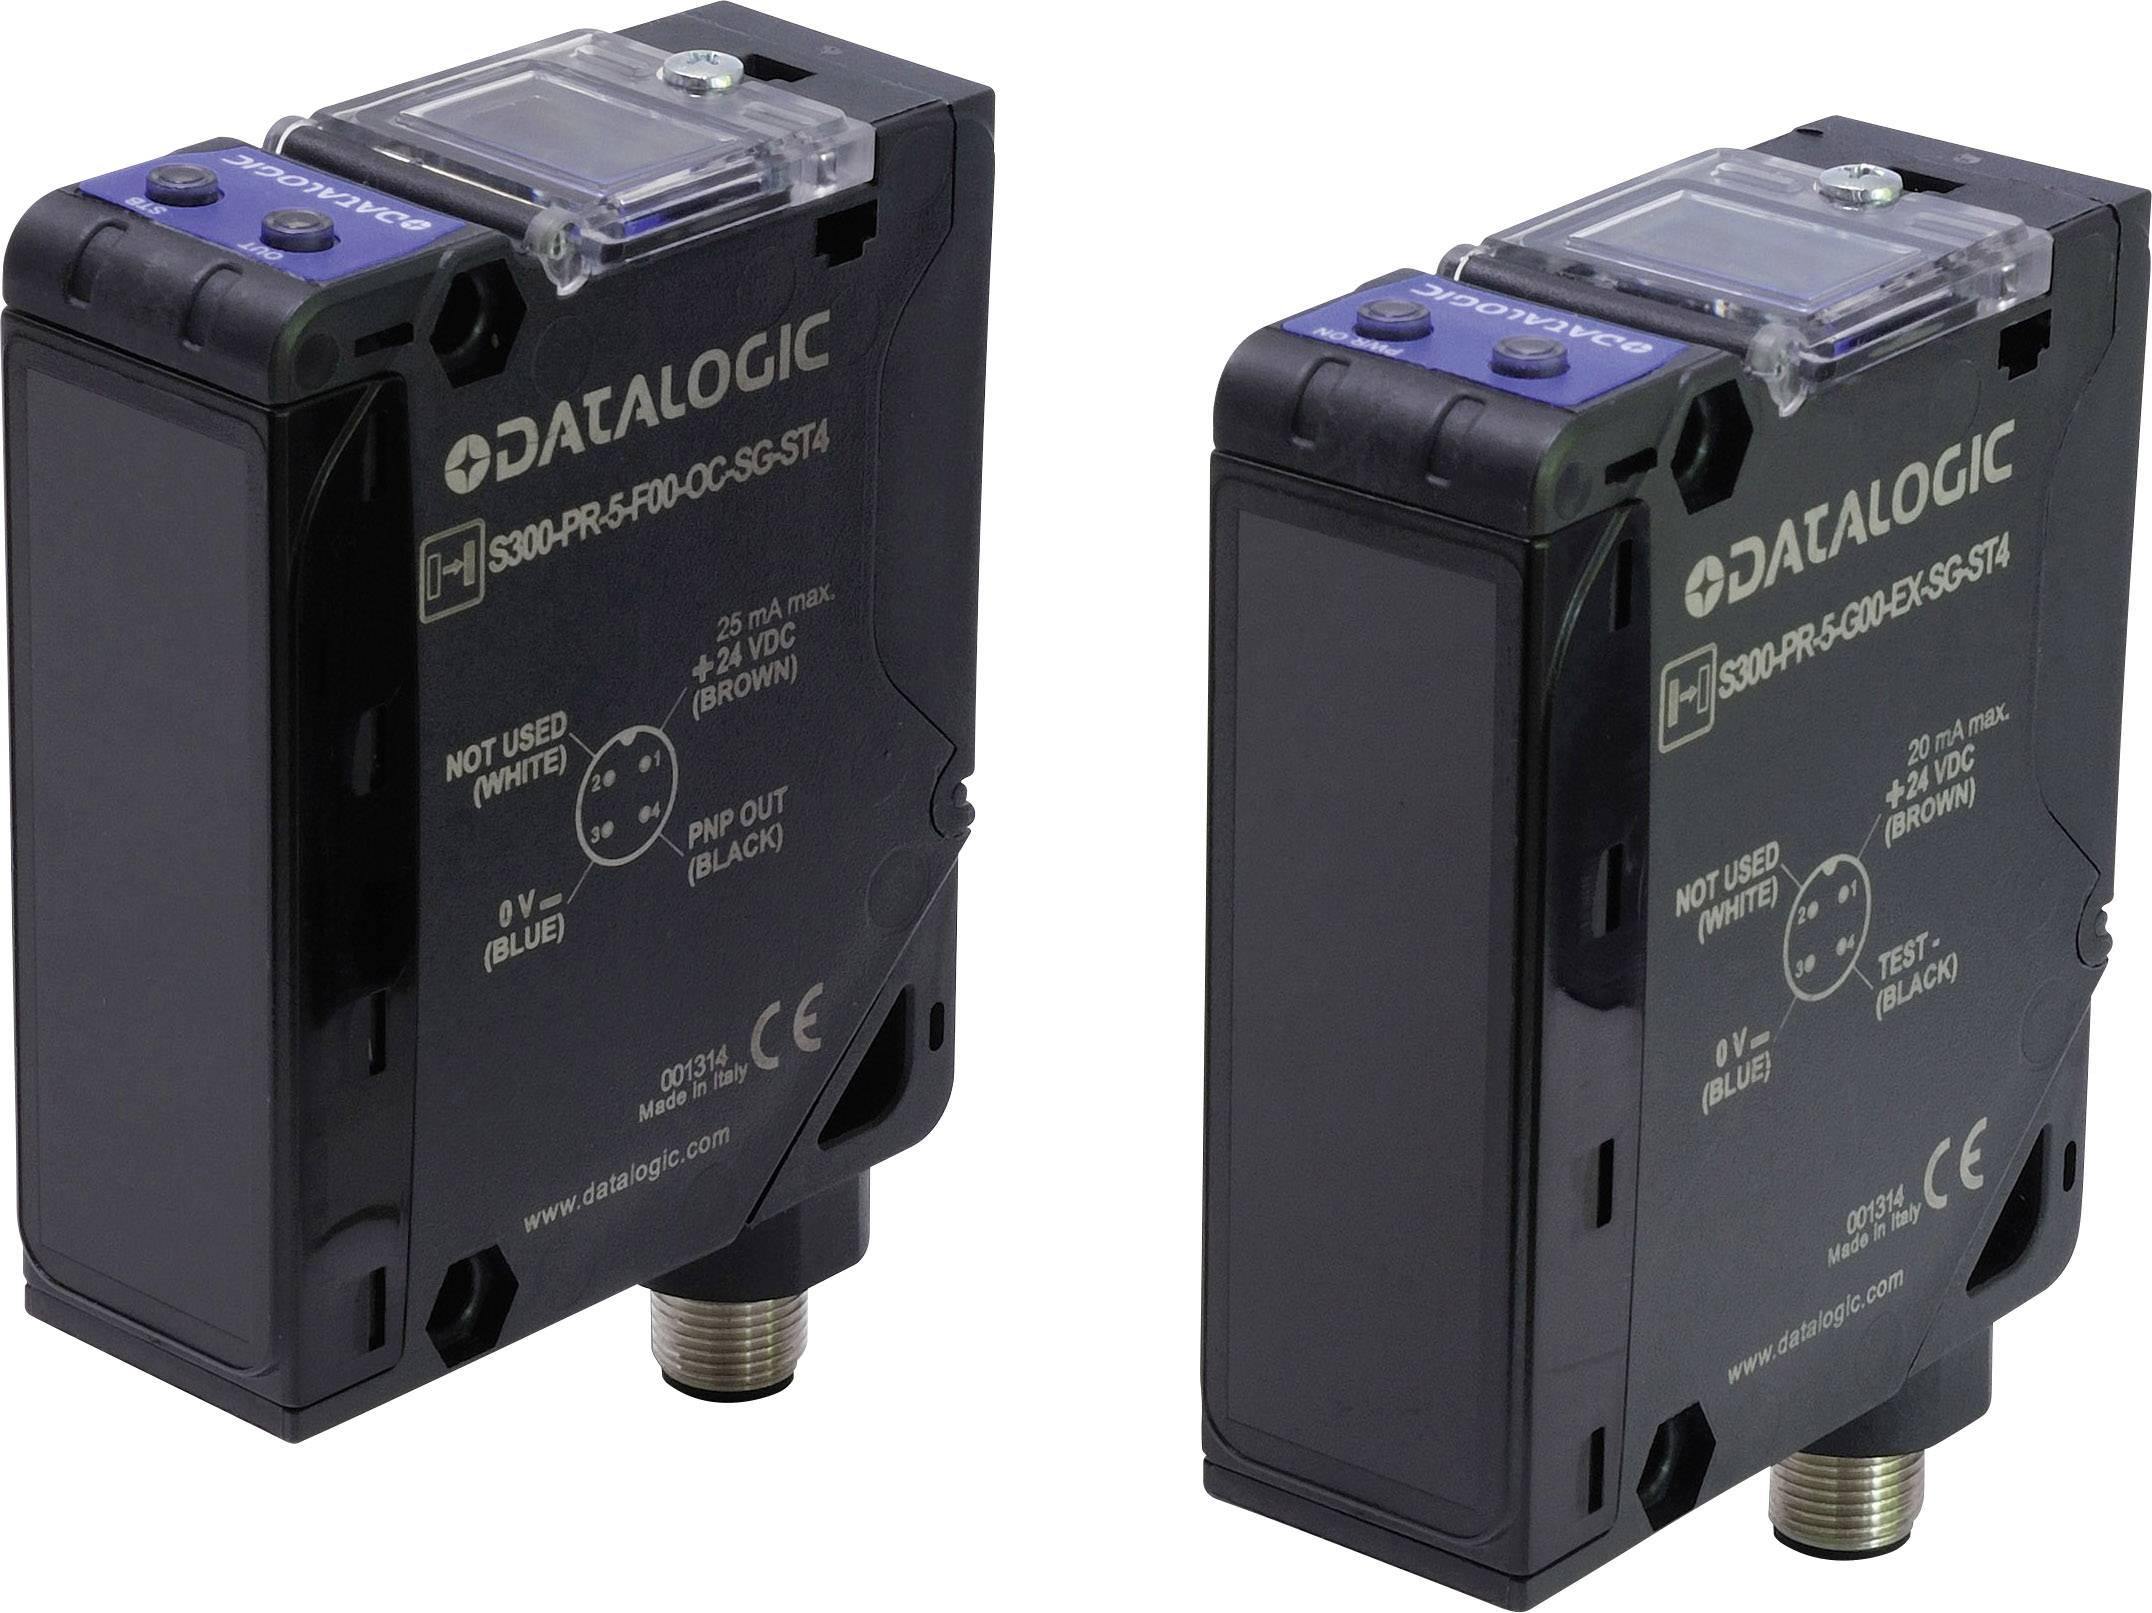 Reflexná svetelná závora DataLogic S300-PR-1-G00-EX 951451300, Max. dosah 60 m